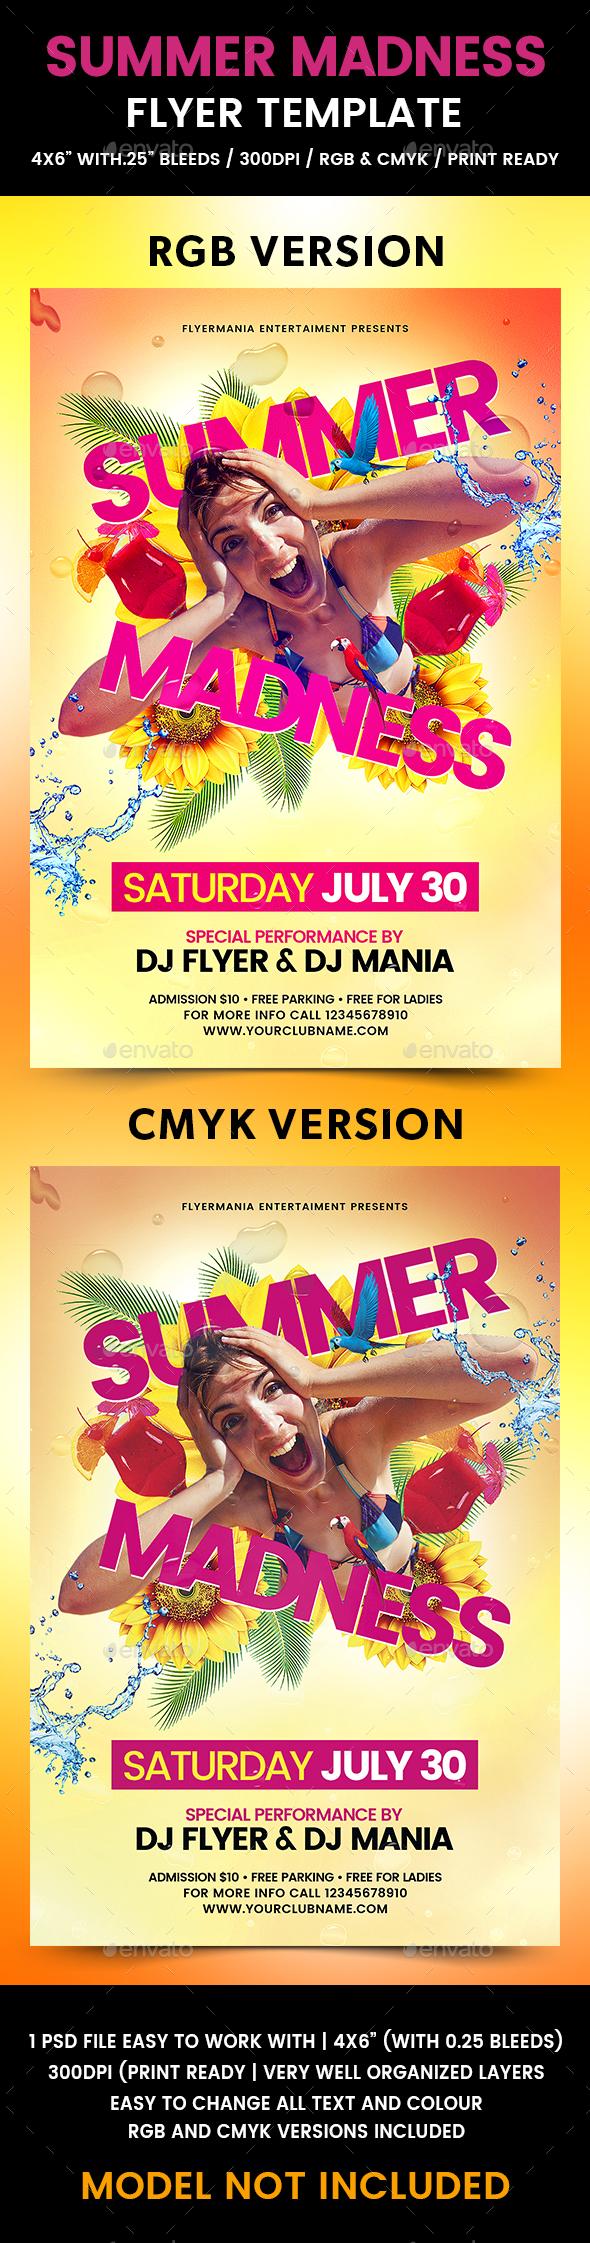 Summer Madness Flyer Template